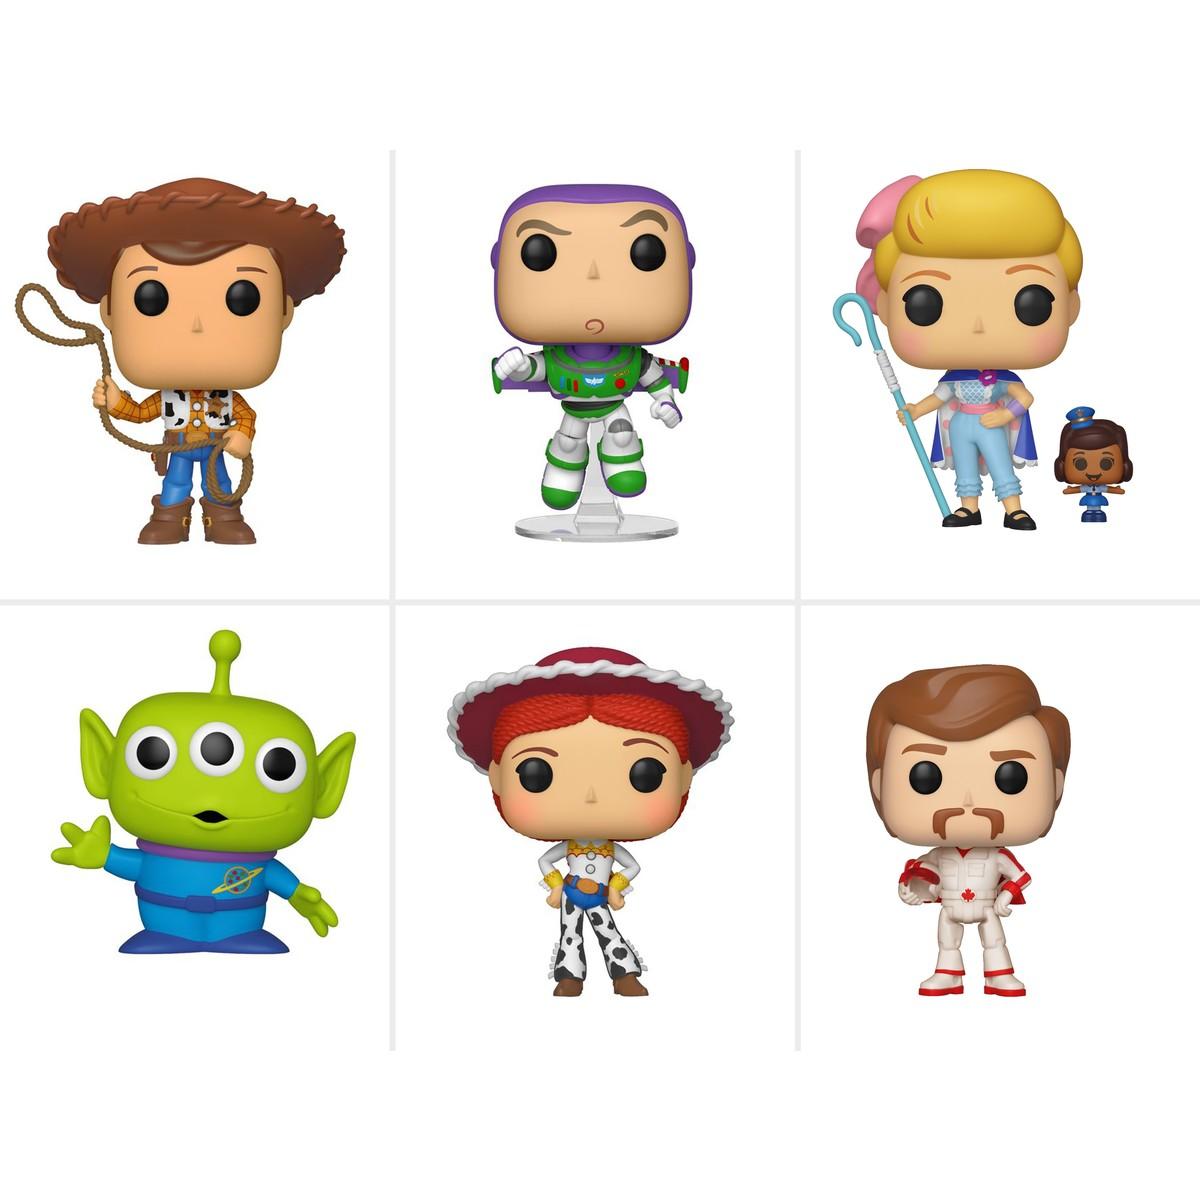 Toy Story 4 Pop Vinyl